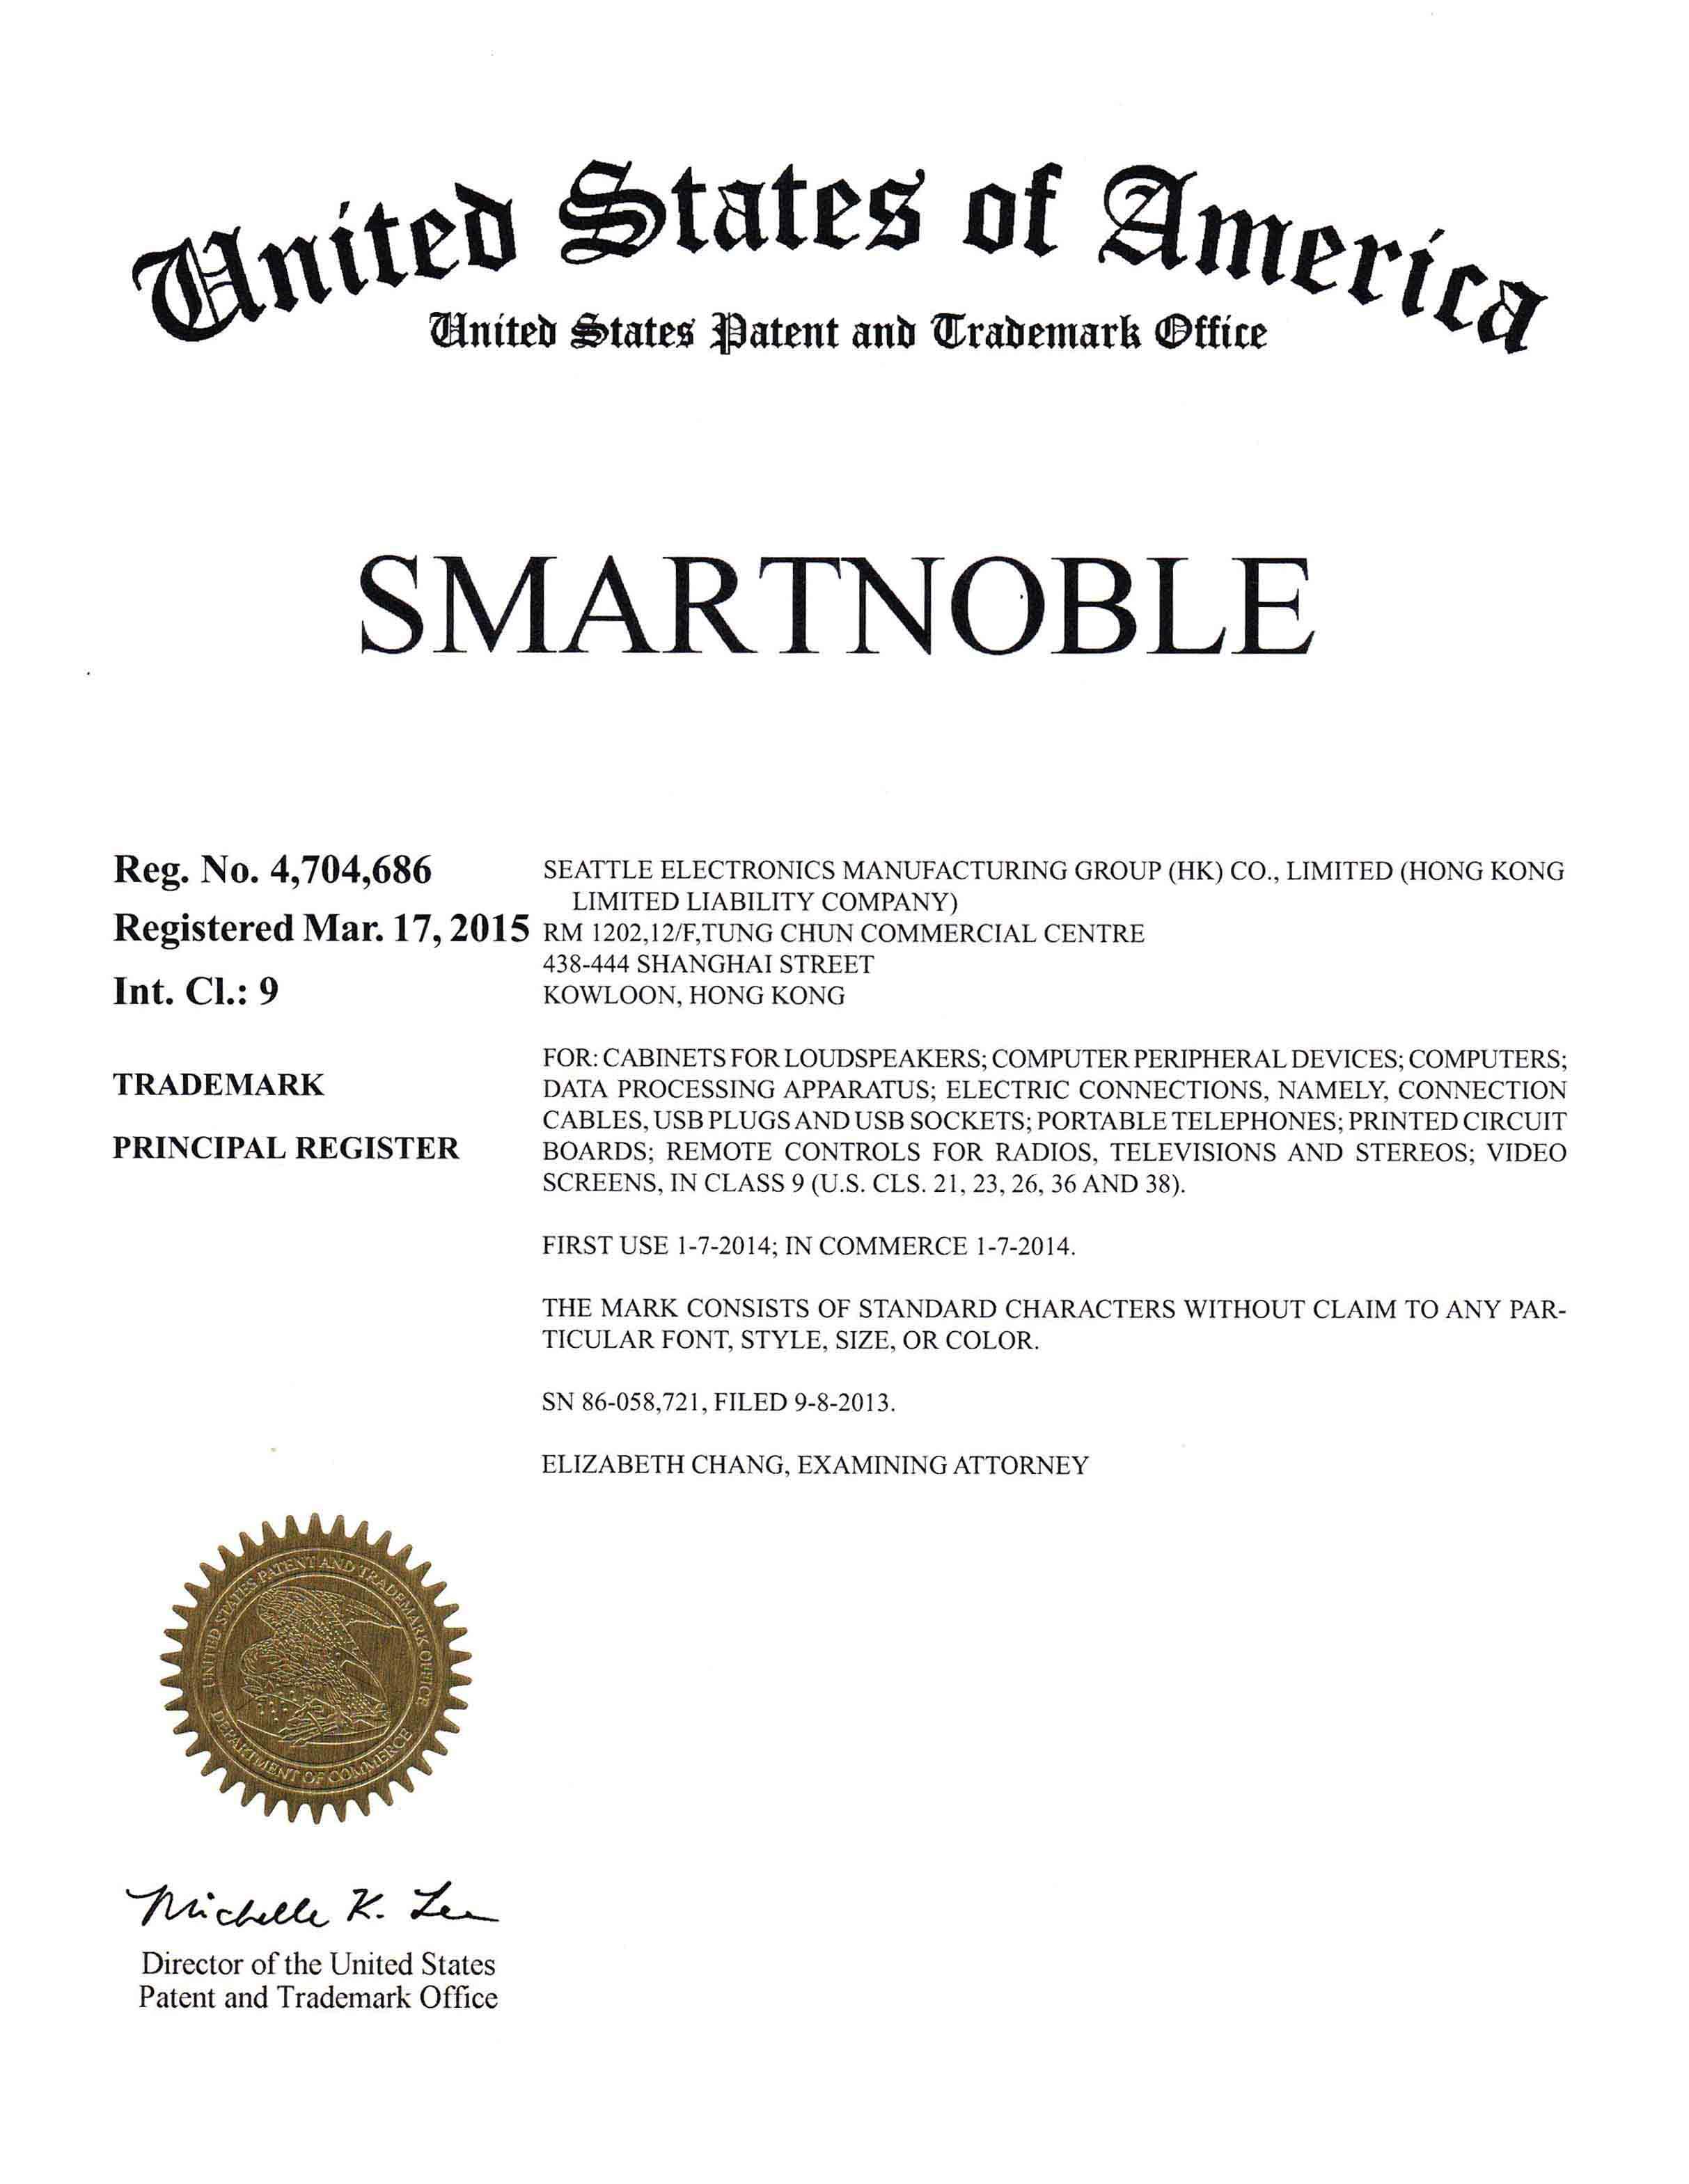 American trademark certificate